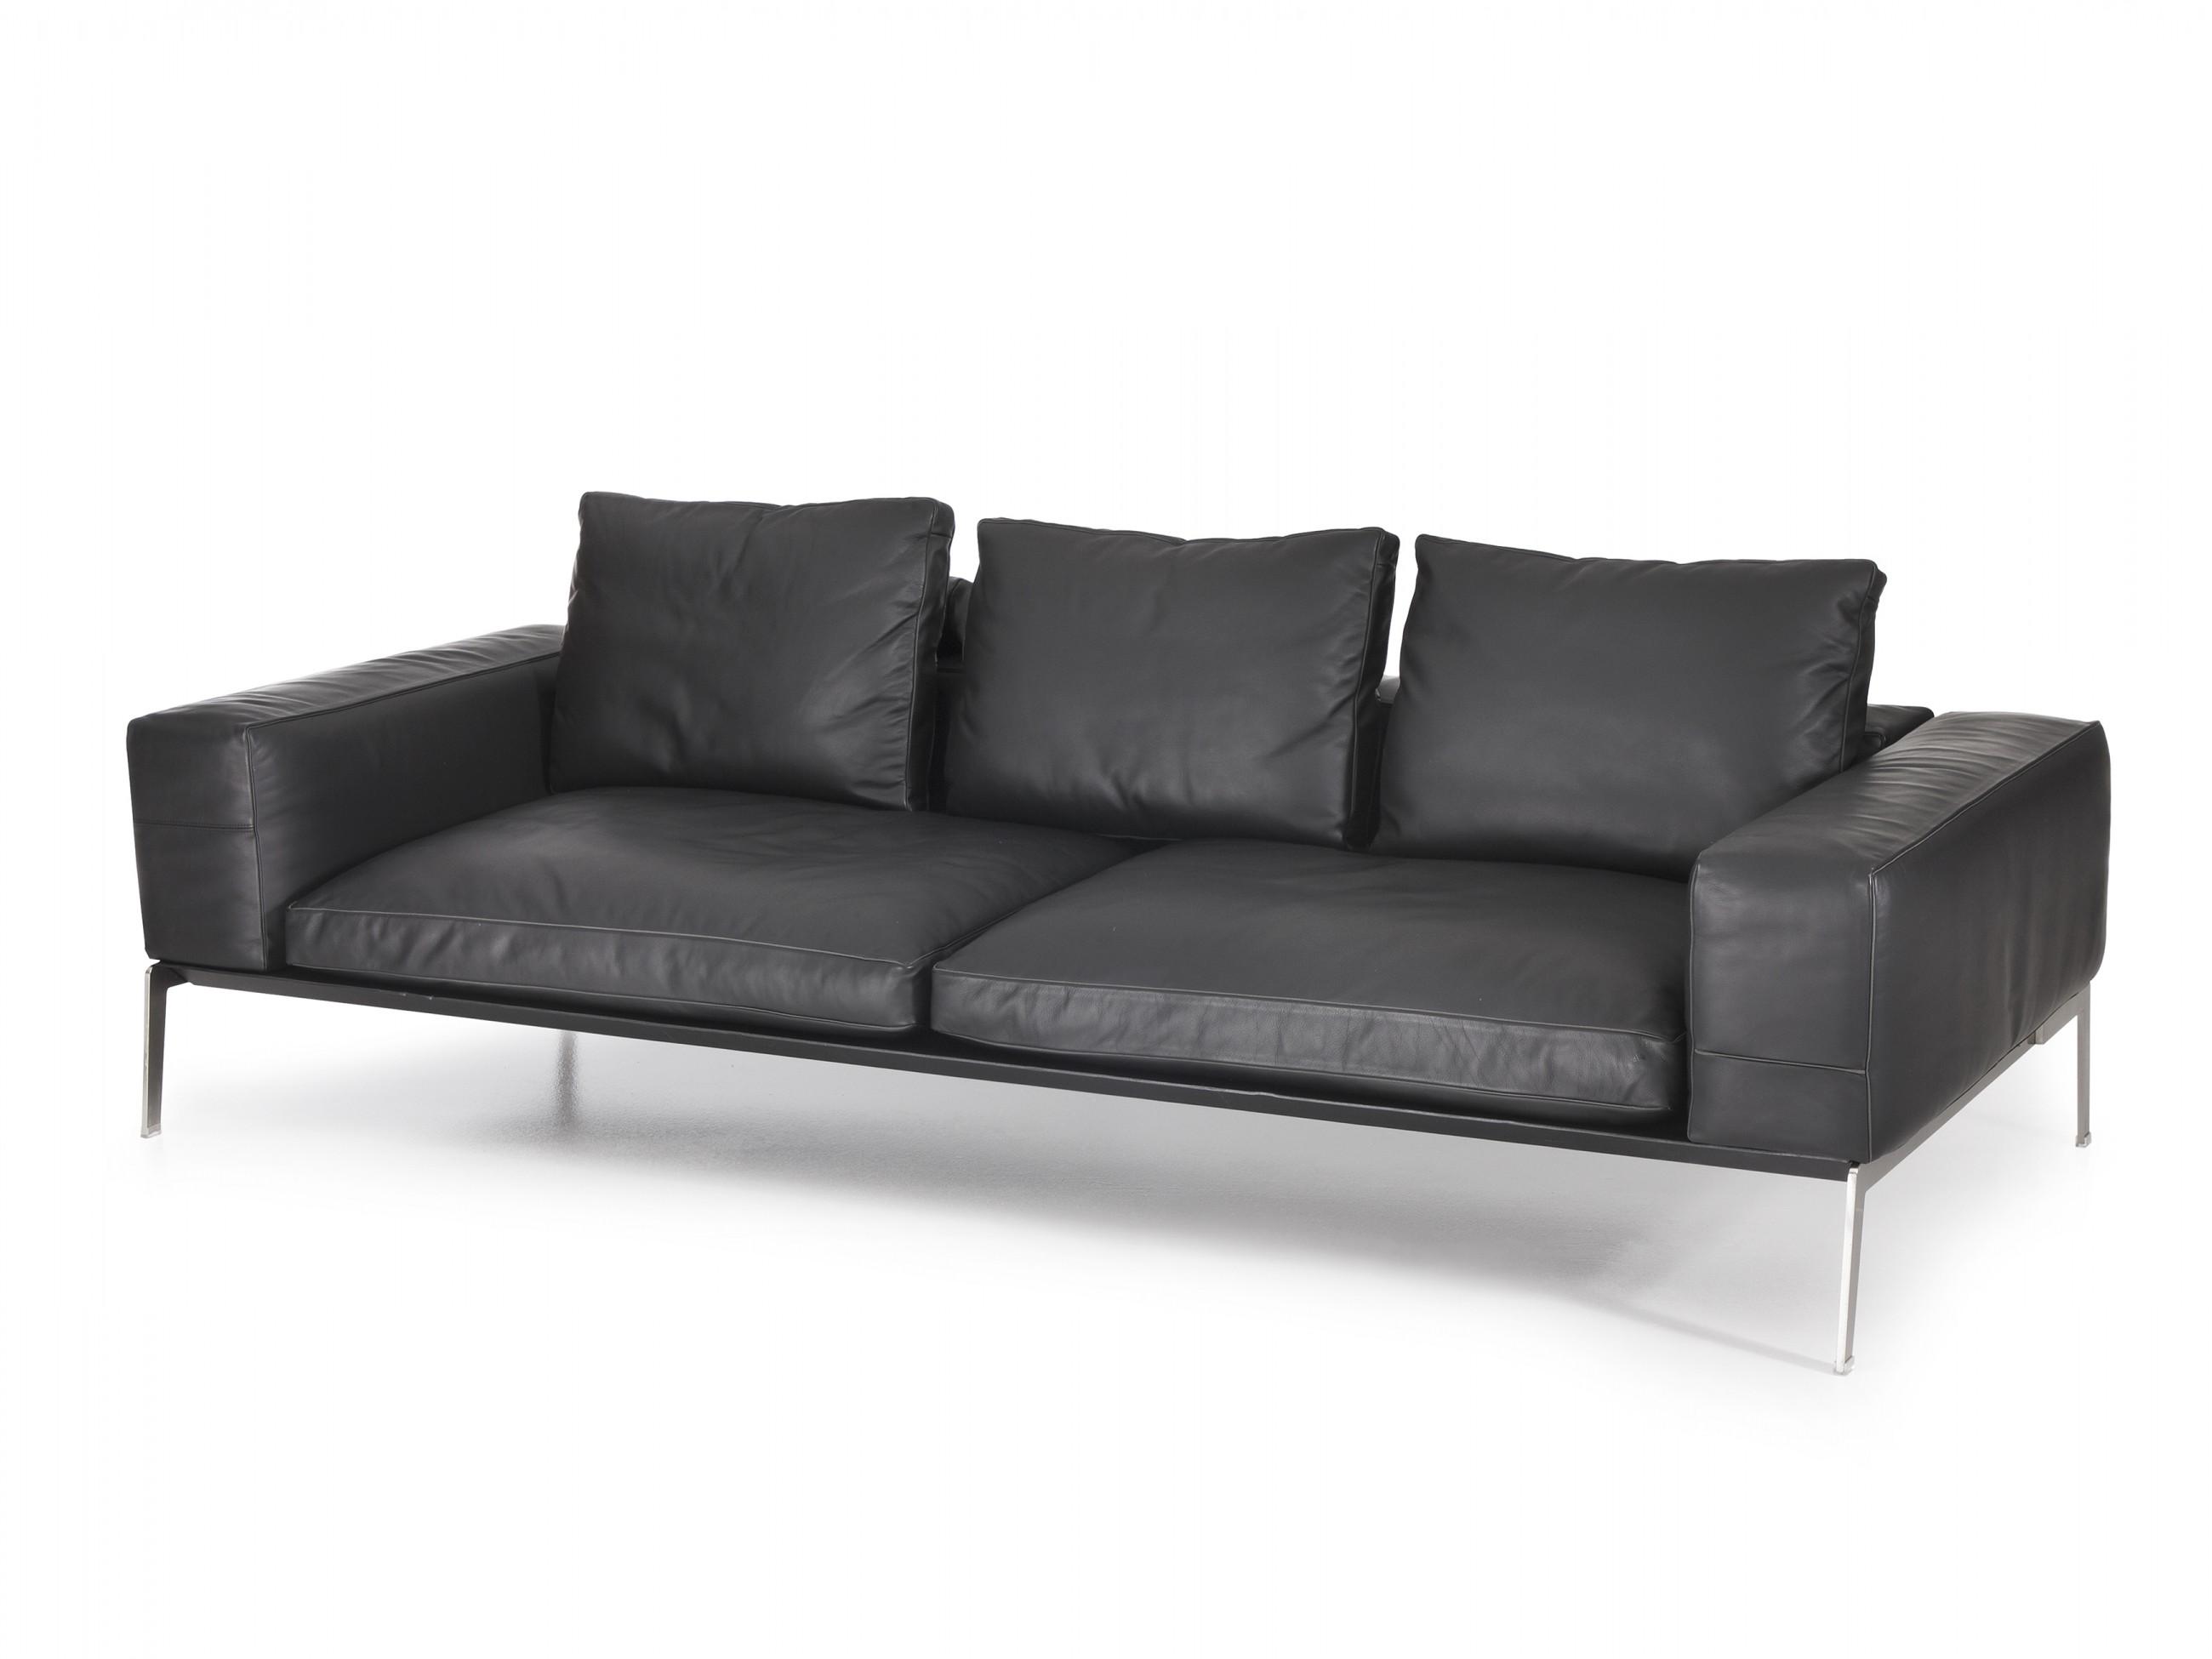 flexform lifesteel sofa hammer auktionen z rich. Black Bedroom Furniture Sets. Home Design Ideas